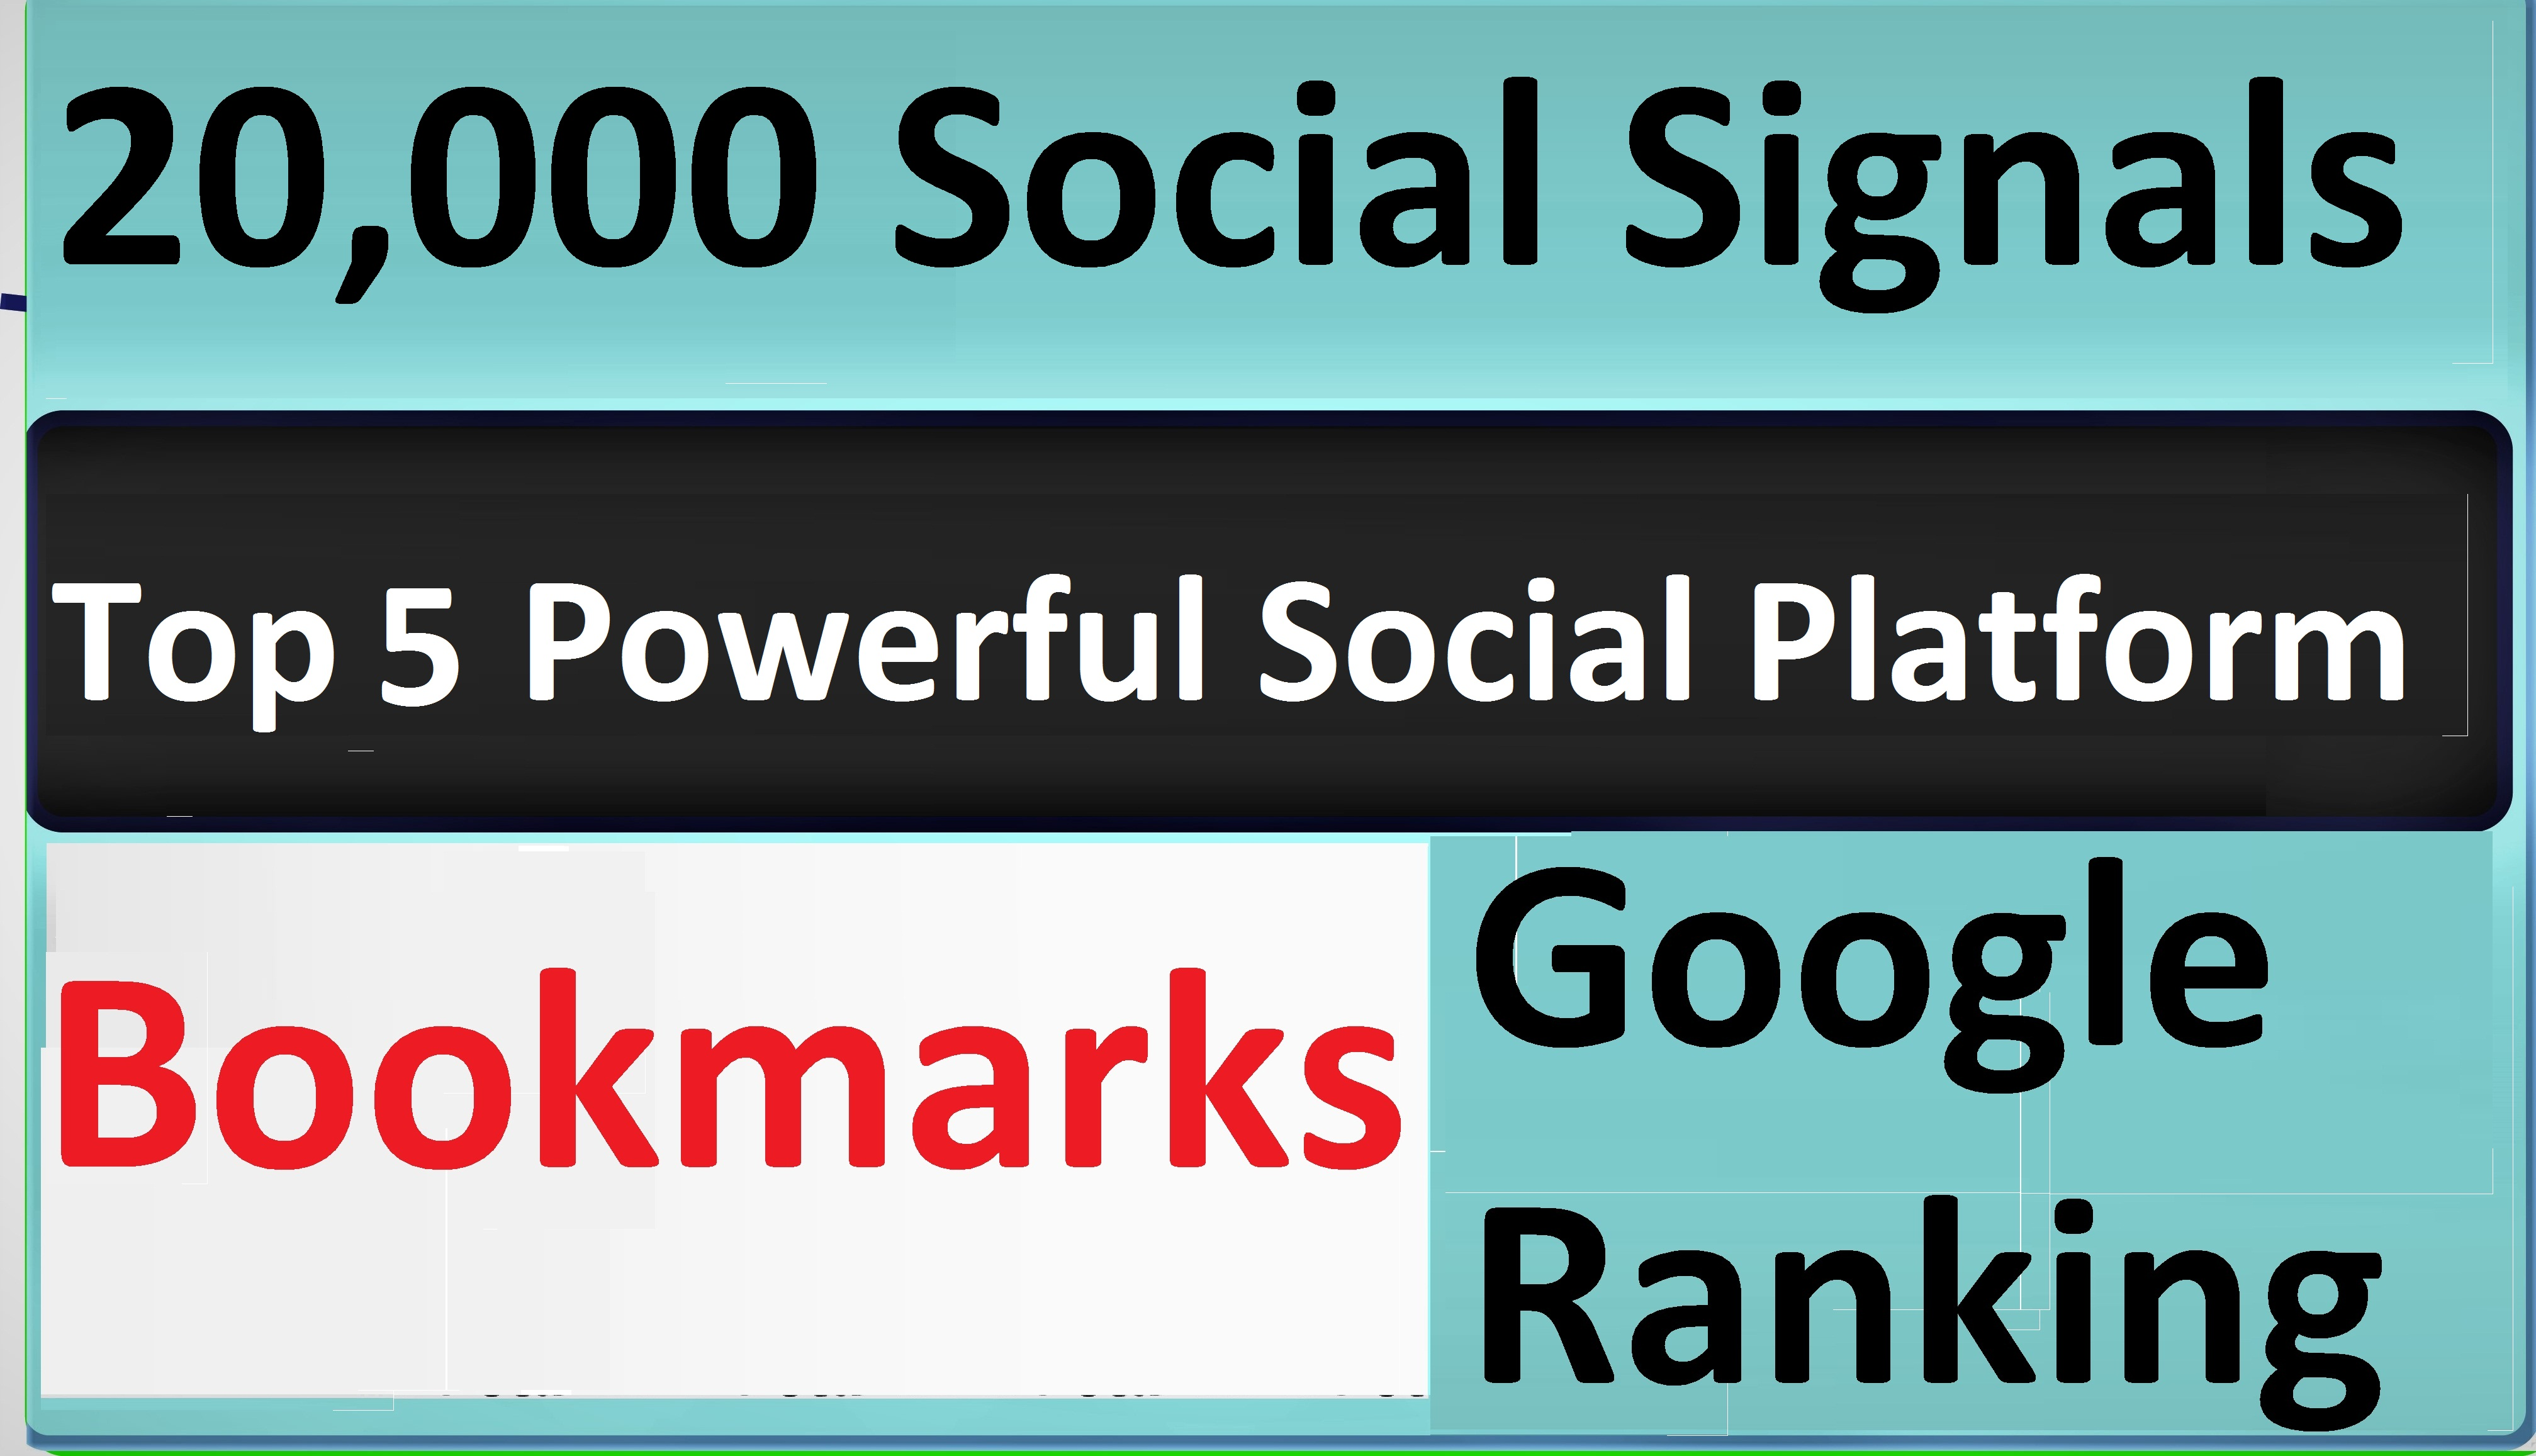 Give Top 5 Powerful Social Platform 20,000 PR9 SEO Social Signals Share Bookmarks Important Google